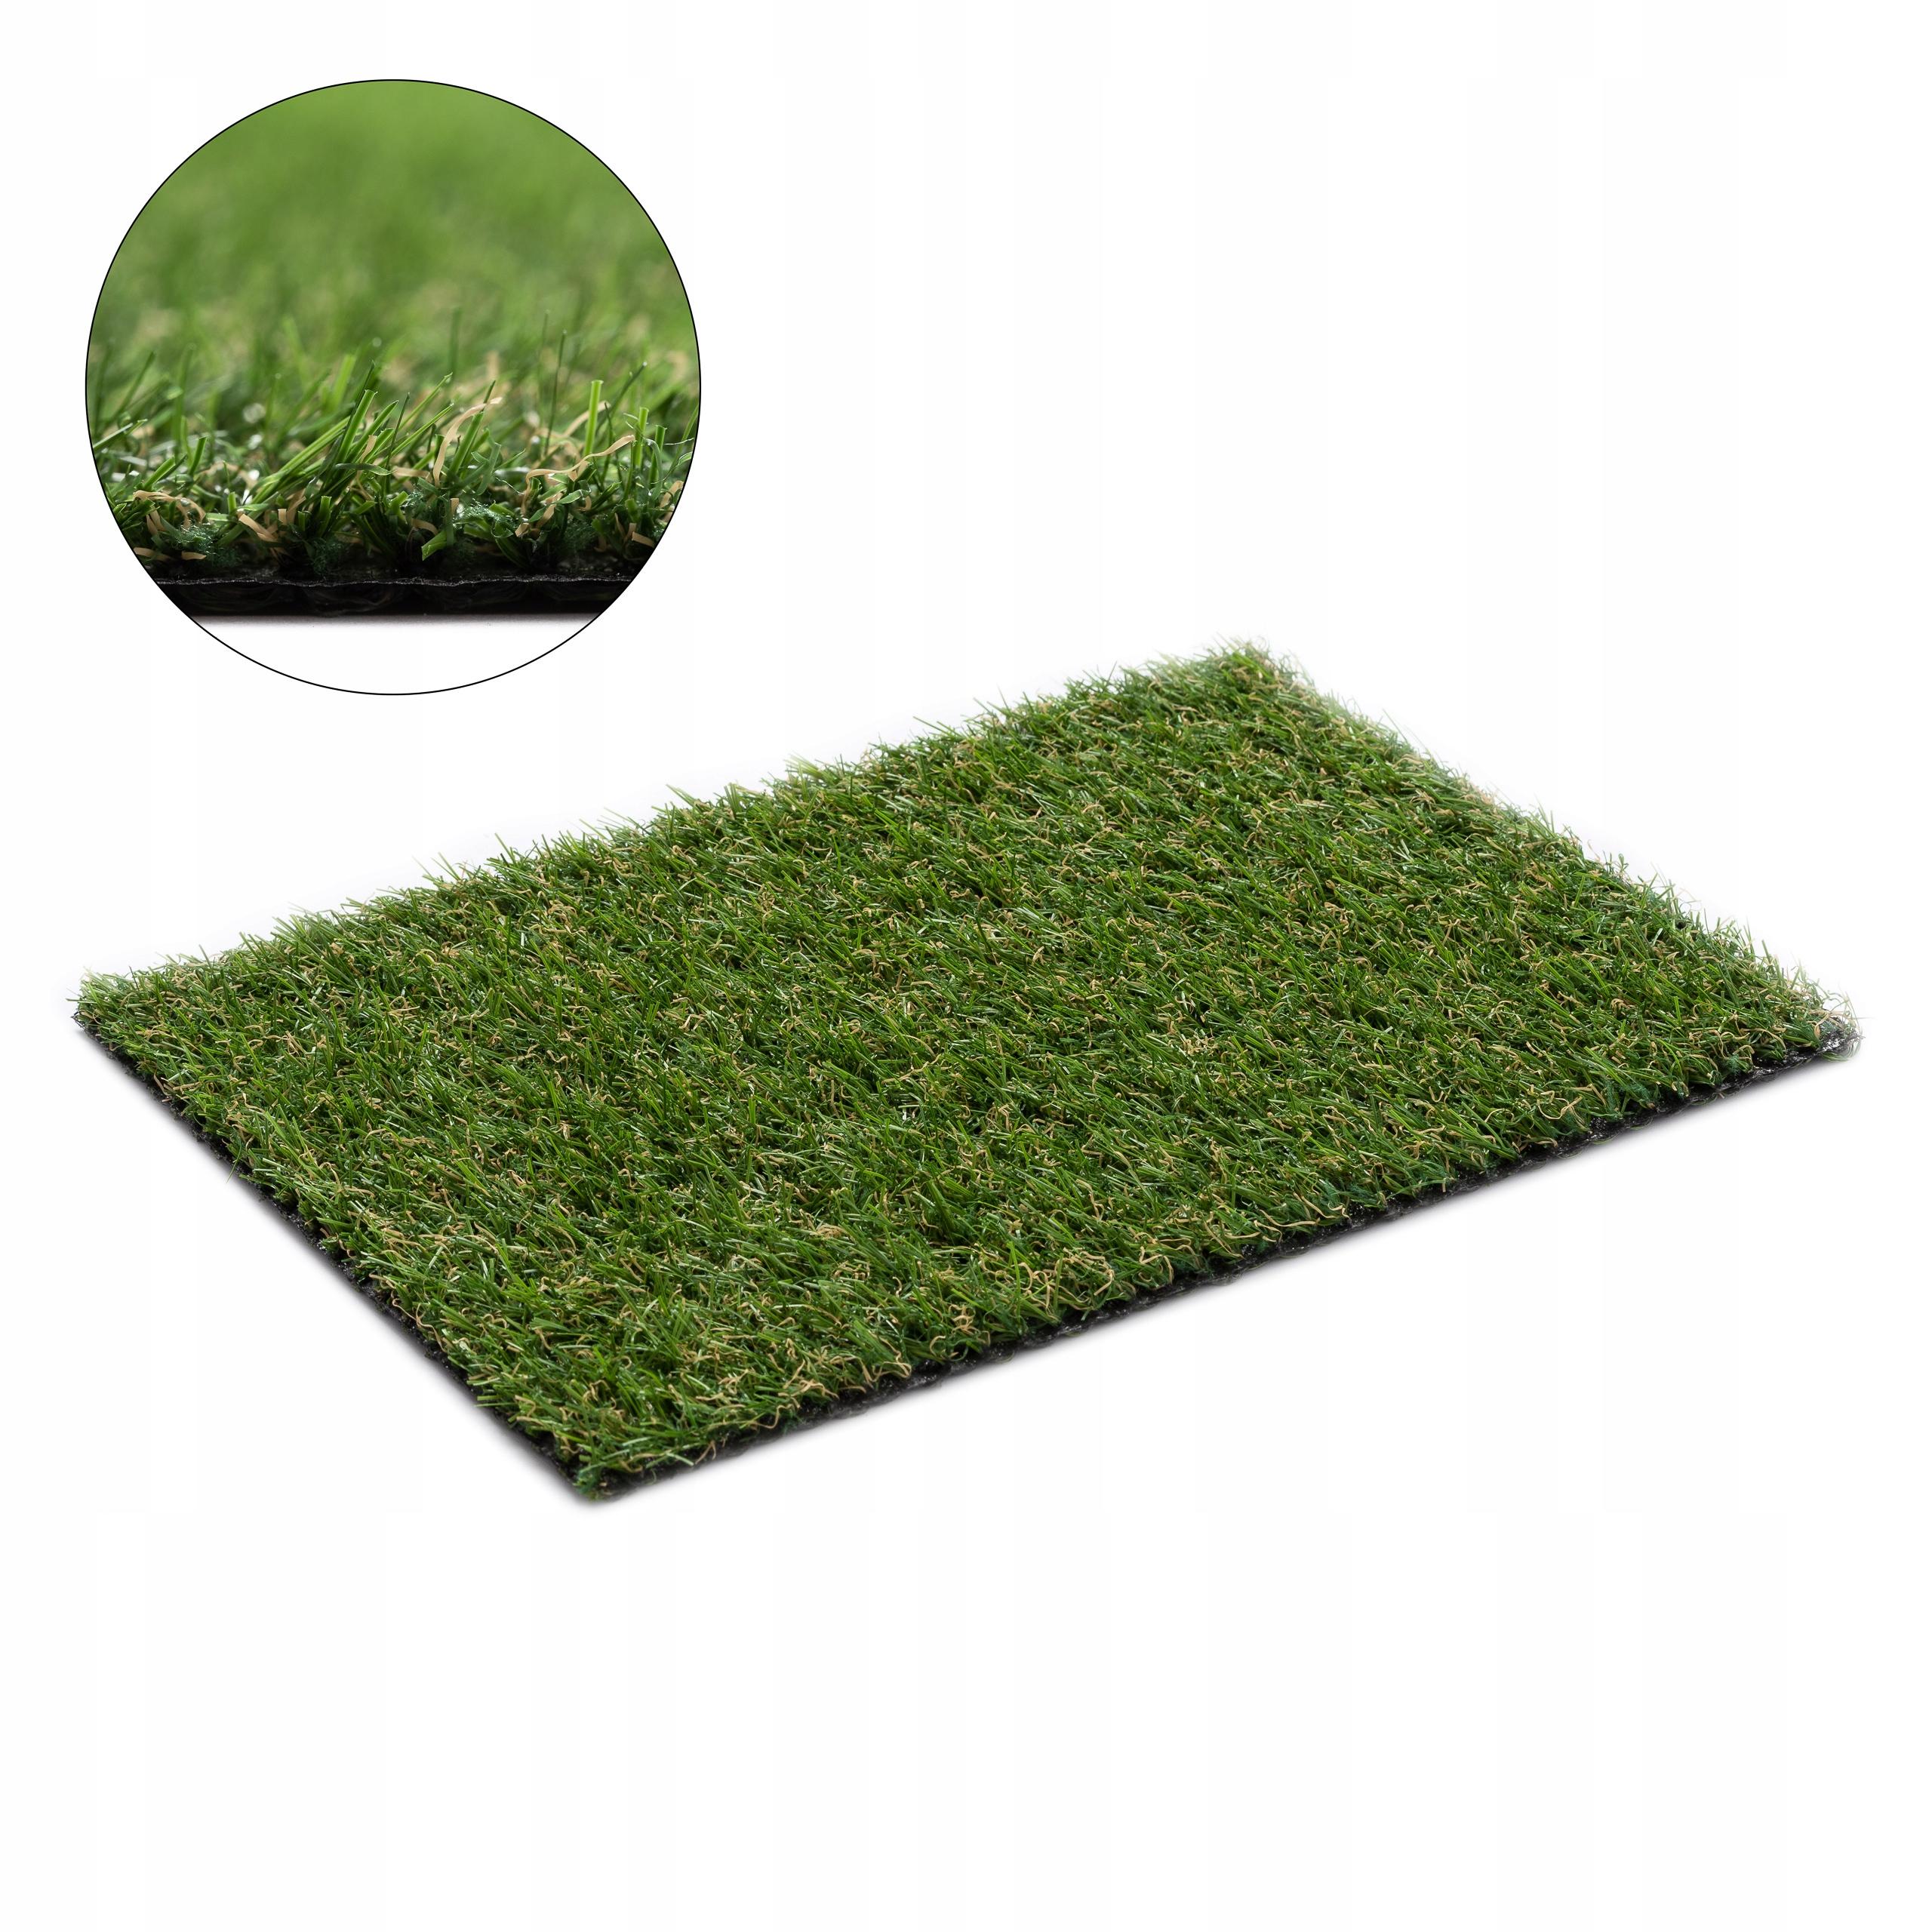 Koberec ZELENÁ BALKÓN GARDEN GRASS ELITE 300x400 cm @87740